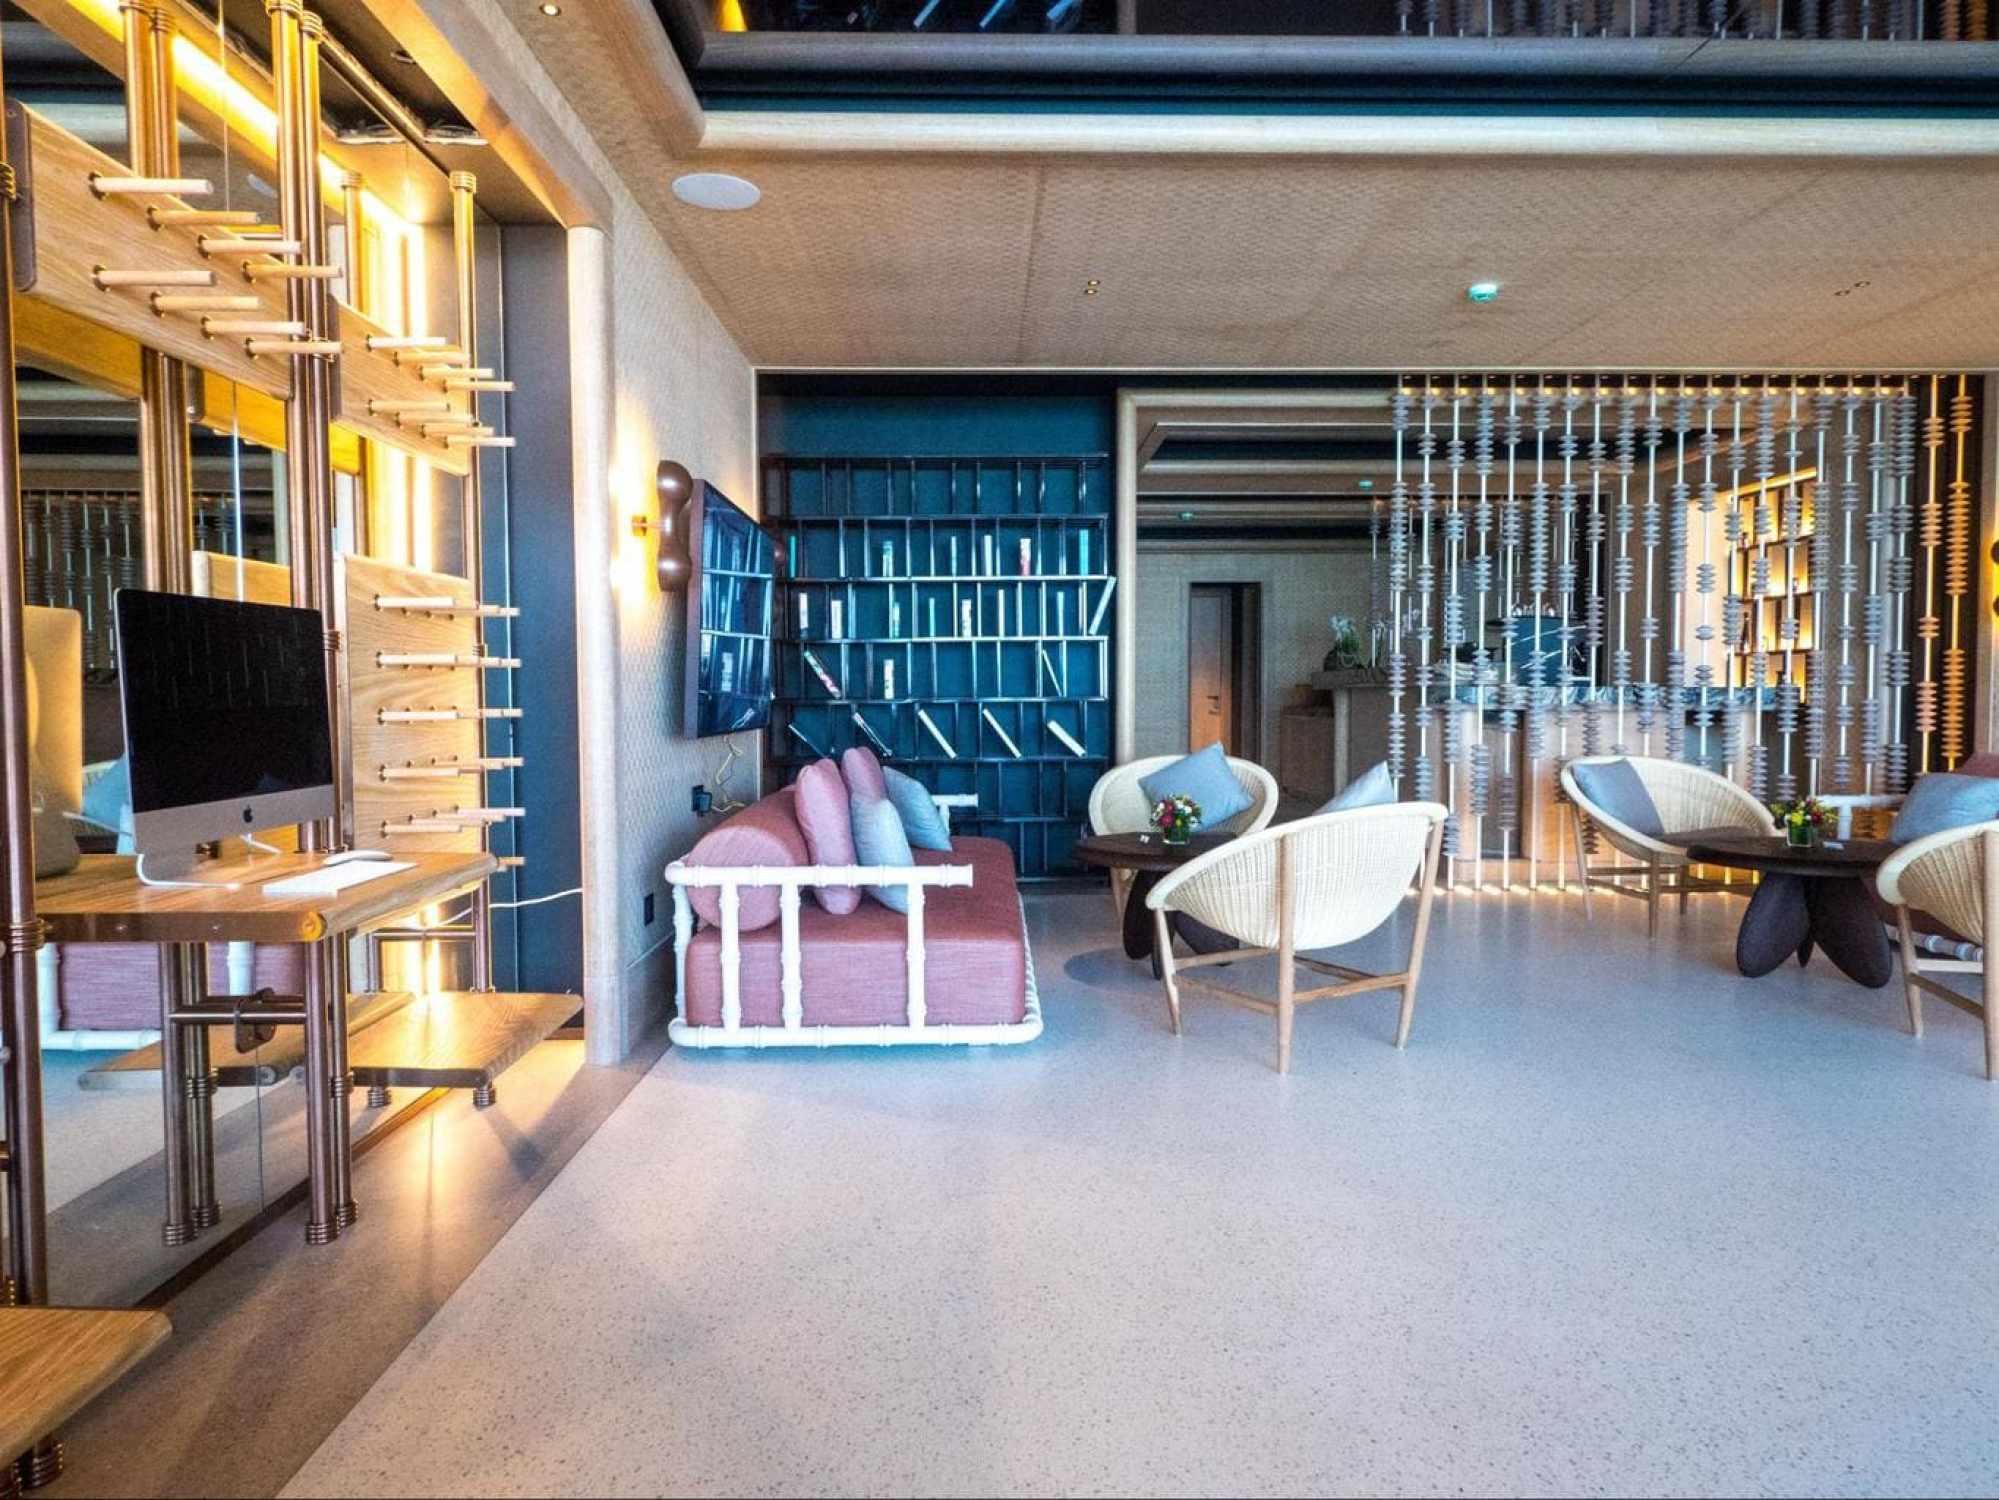 Design at the Joali seaplane lounge